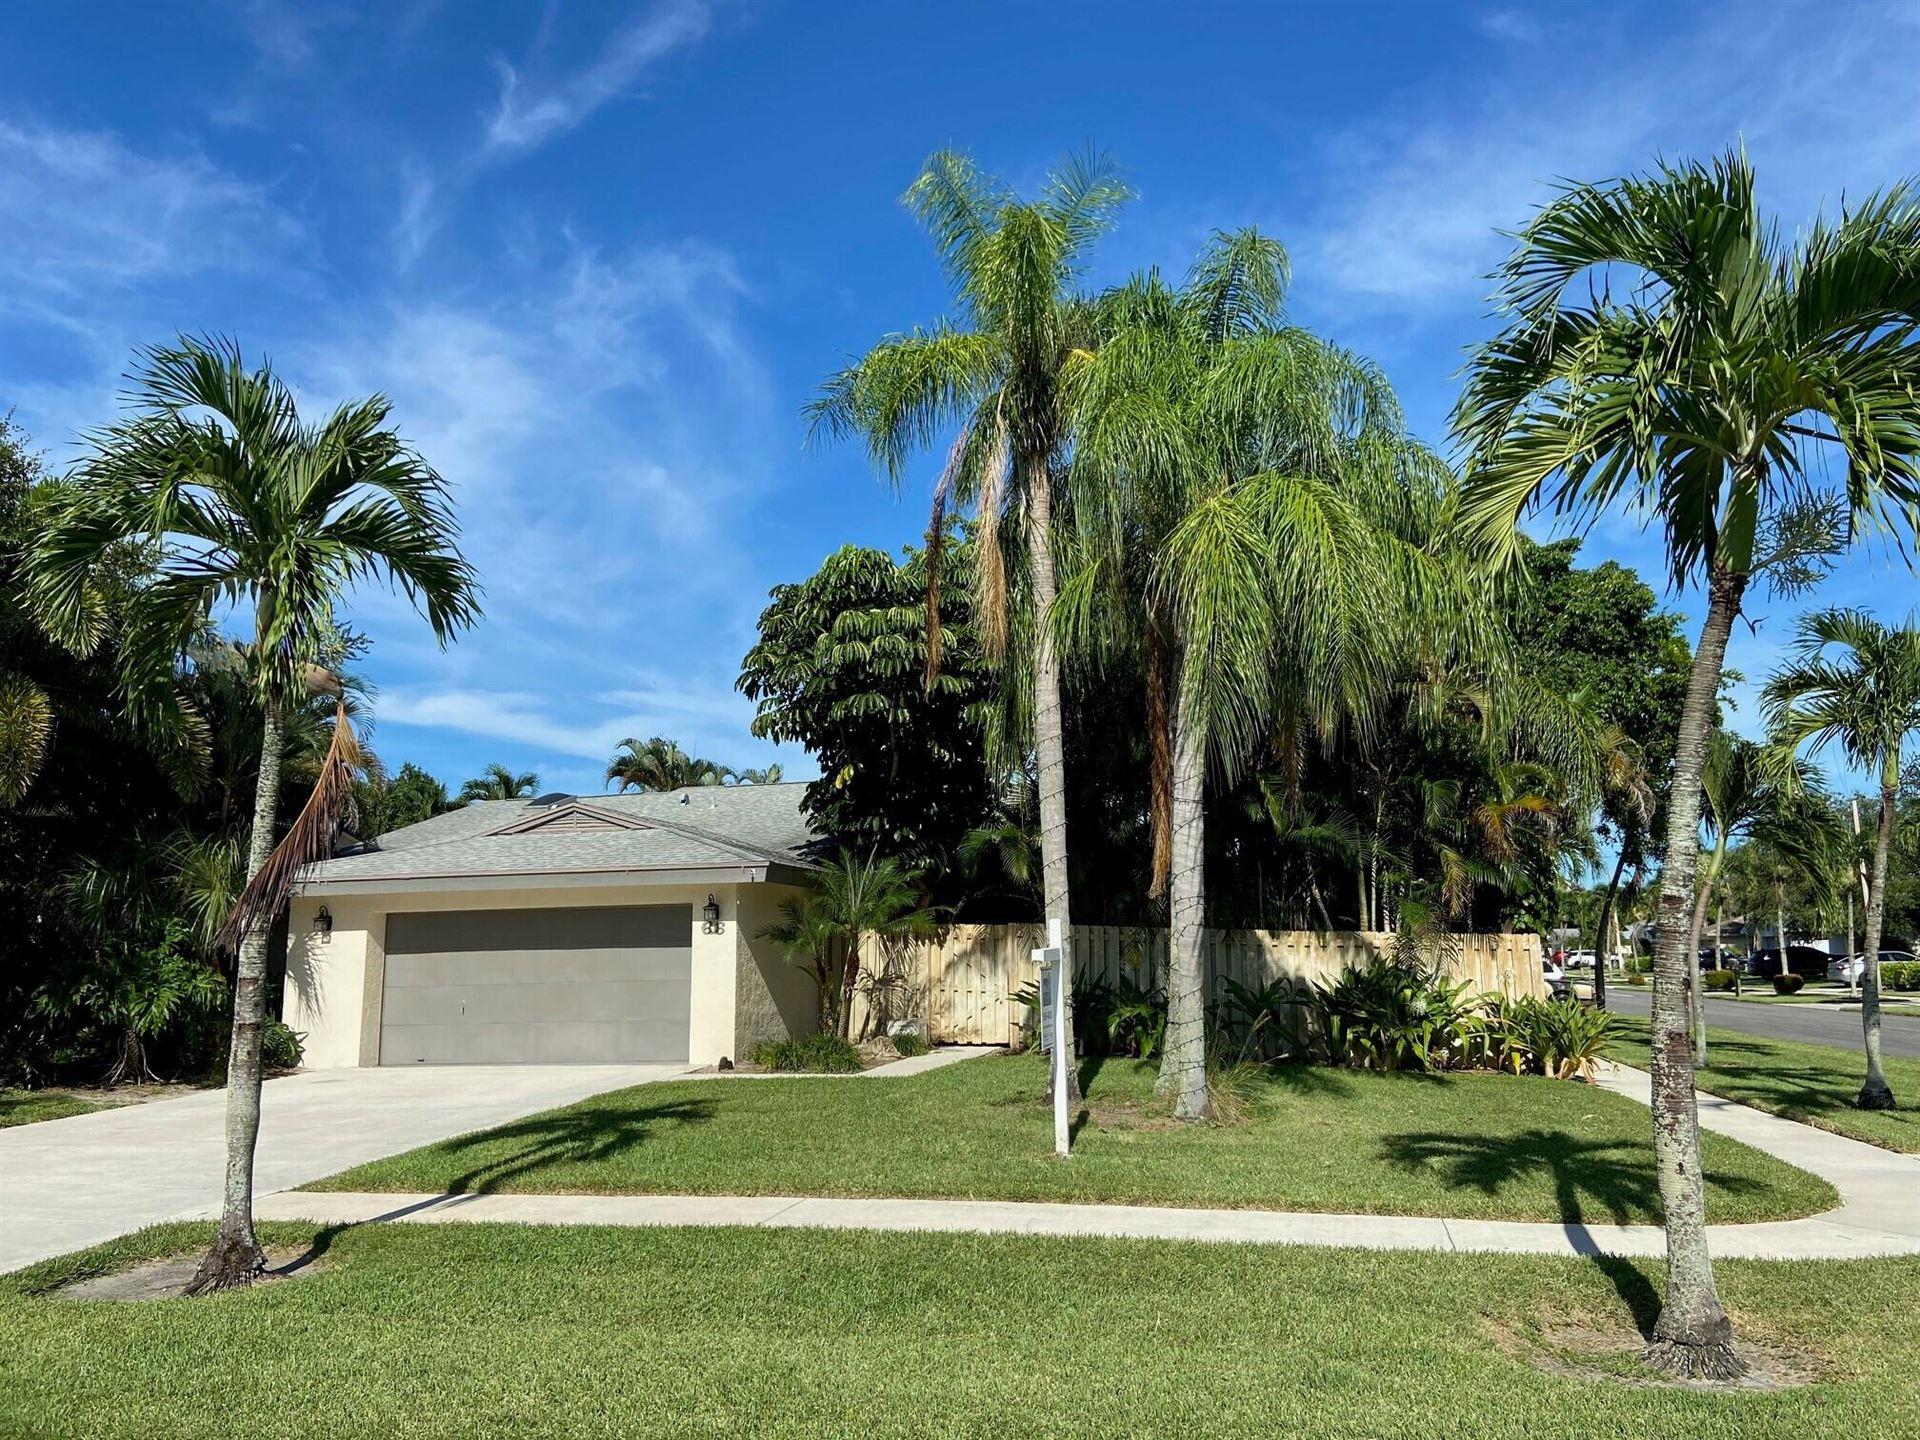 Photo of 66 Baytree Circle, Boynton Beach, FL 33436 (MLS # RX-10733753)